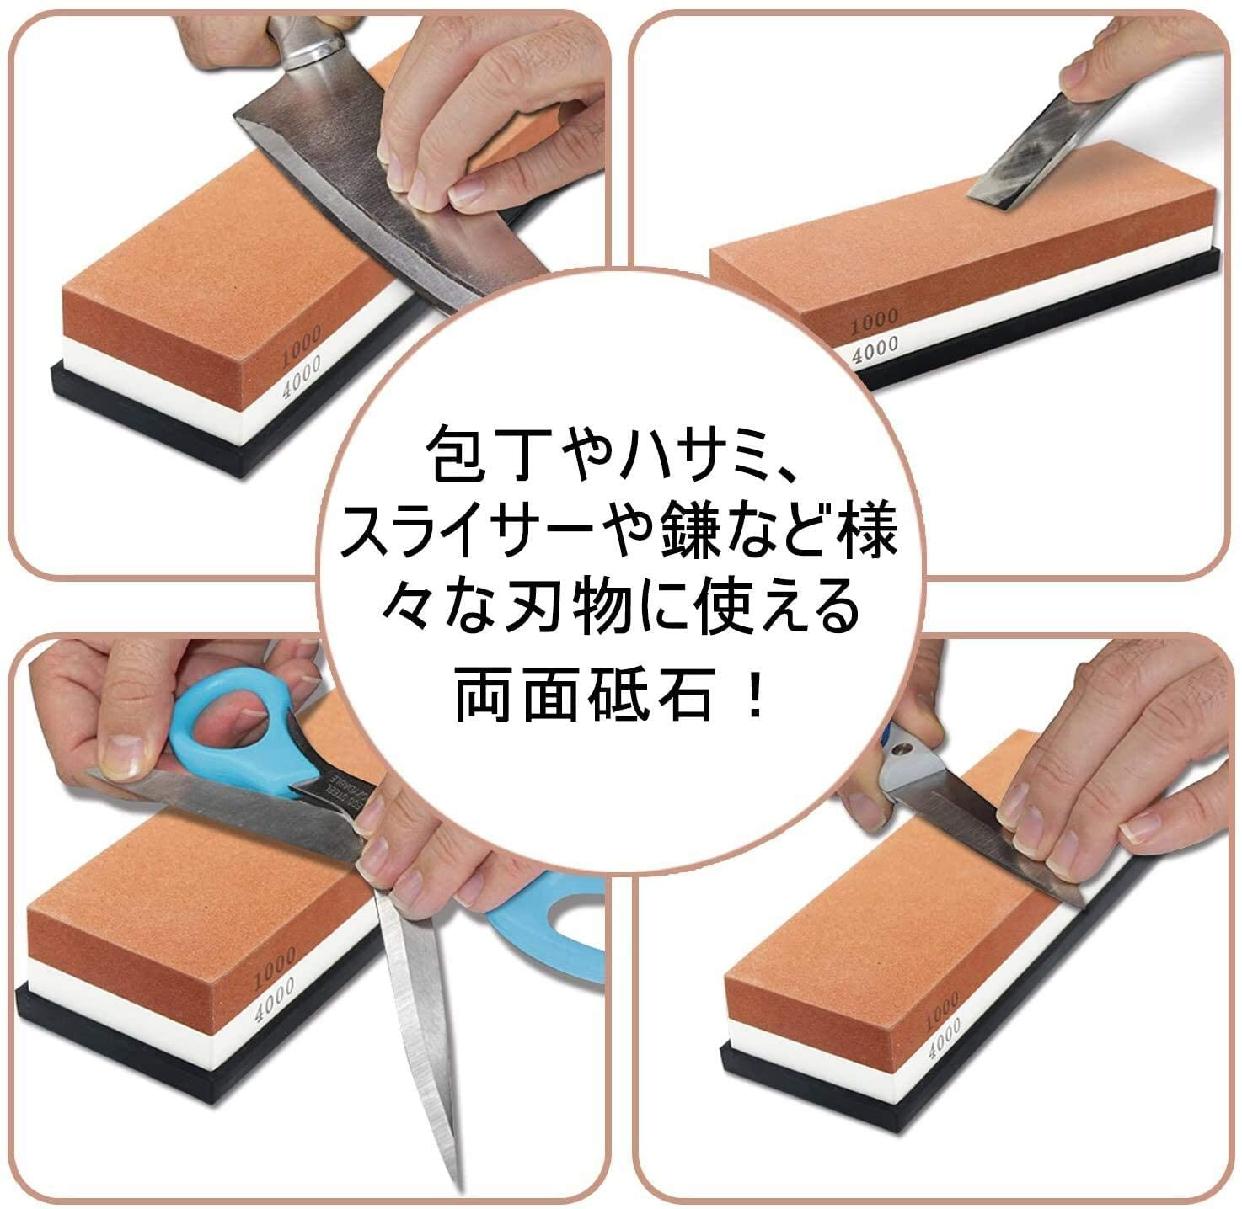 Hiveseen 両面包丁用砥石 レッドの商品画像6